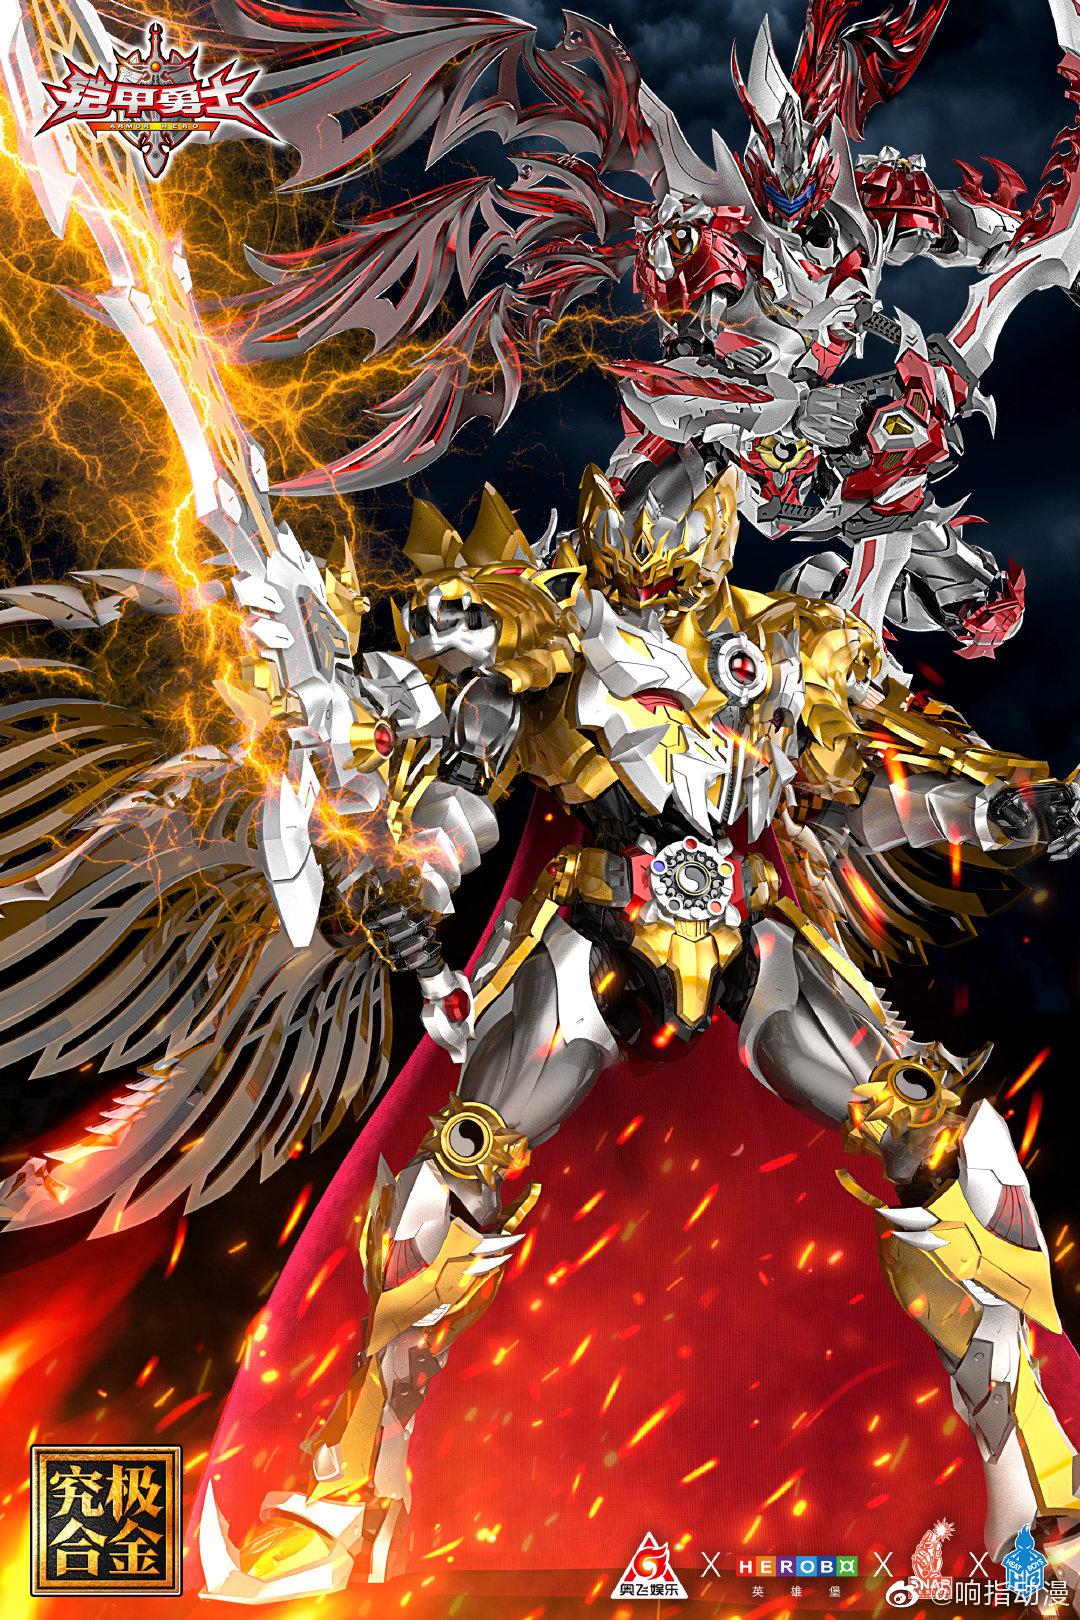 S535_Armor_hero_Emperor_040.jpg